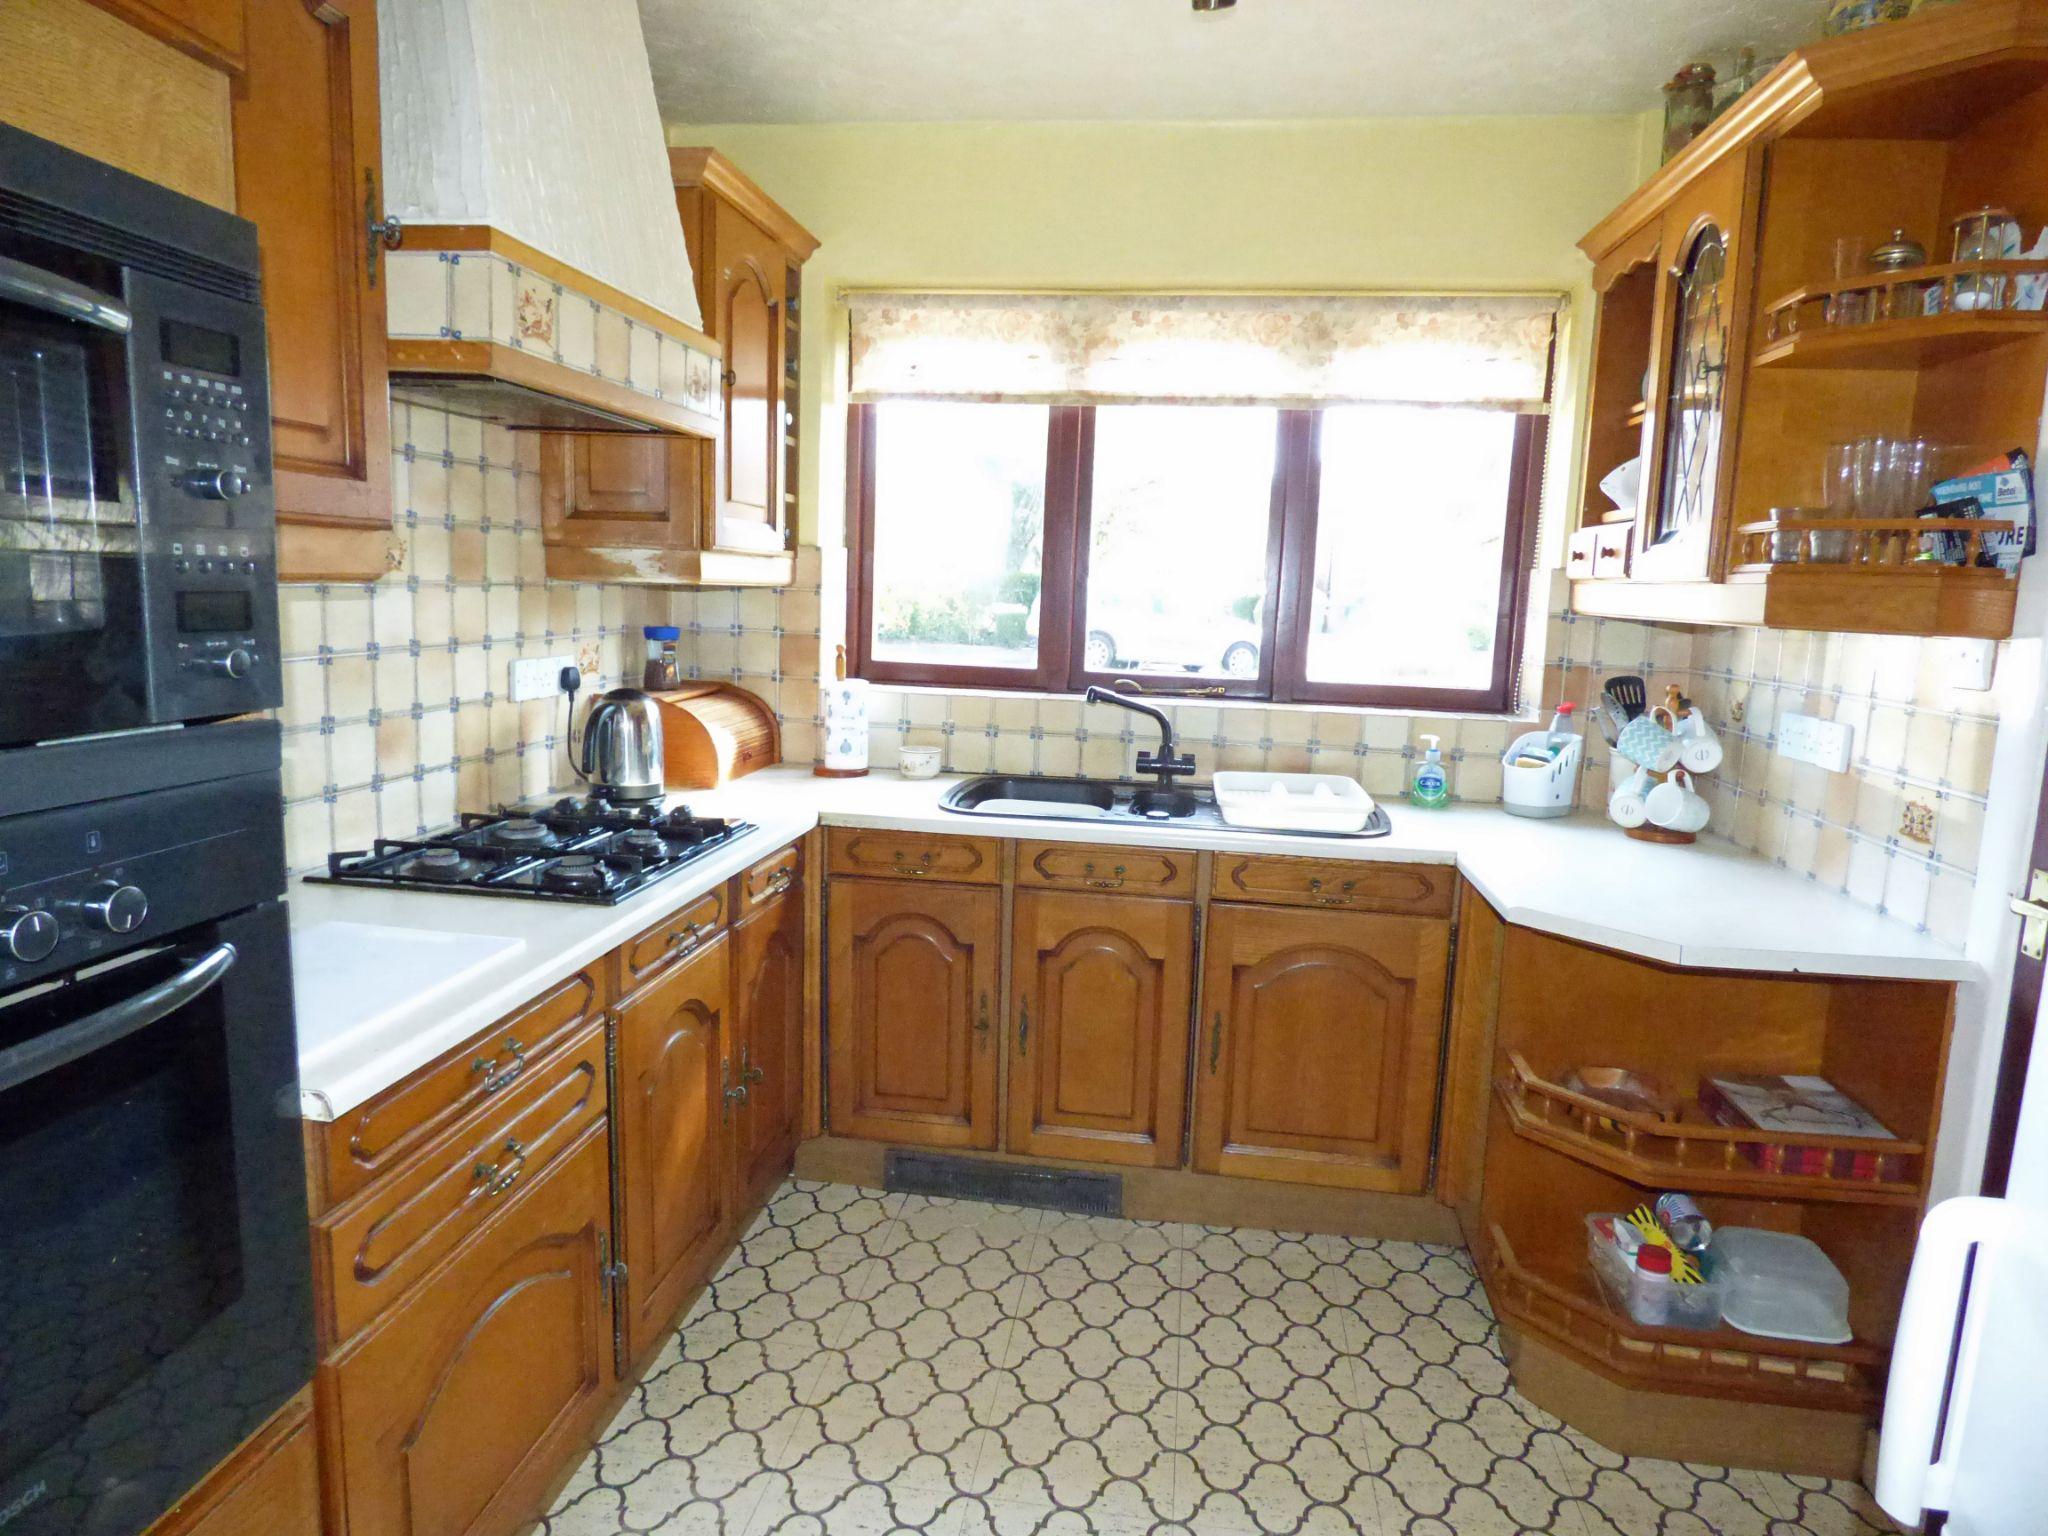 3 Bedroom Detached House For Sale - Kitchen